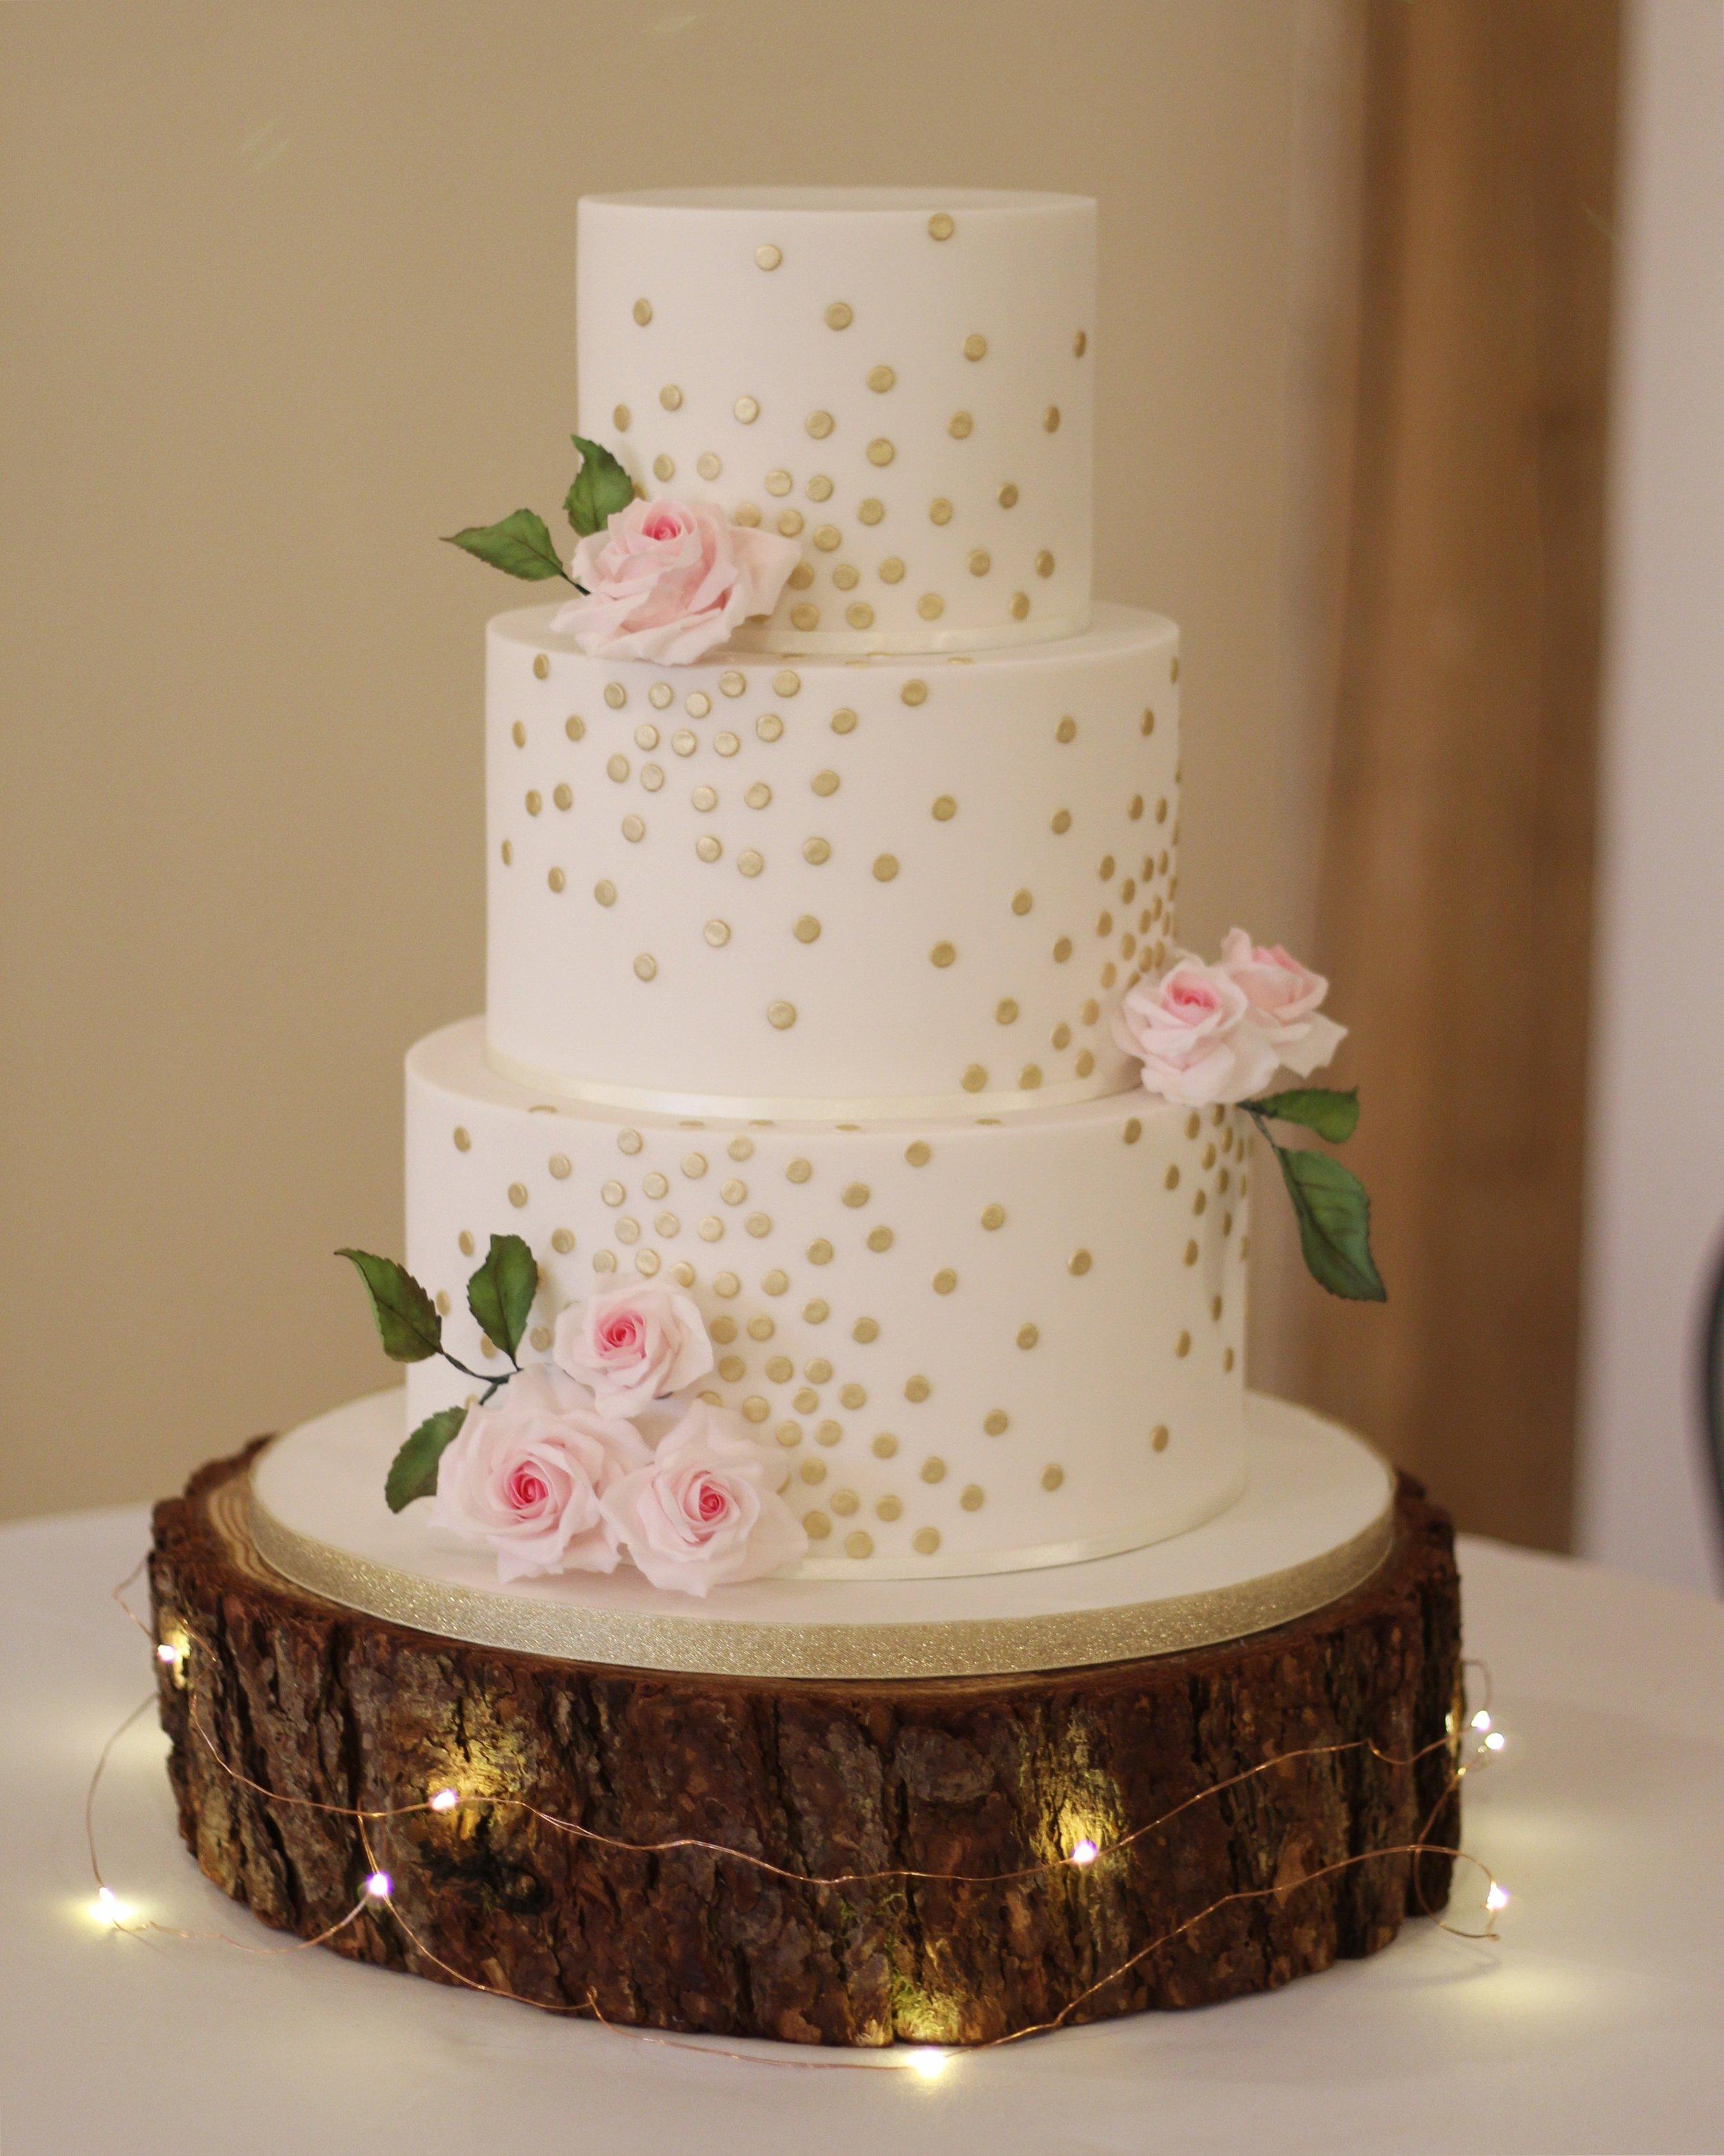 Gold Polka Dot Rose Cake